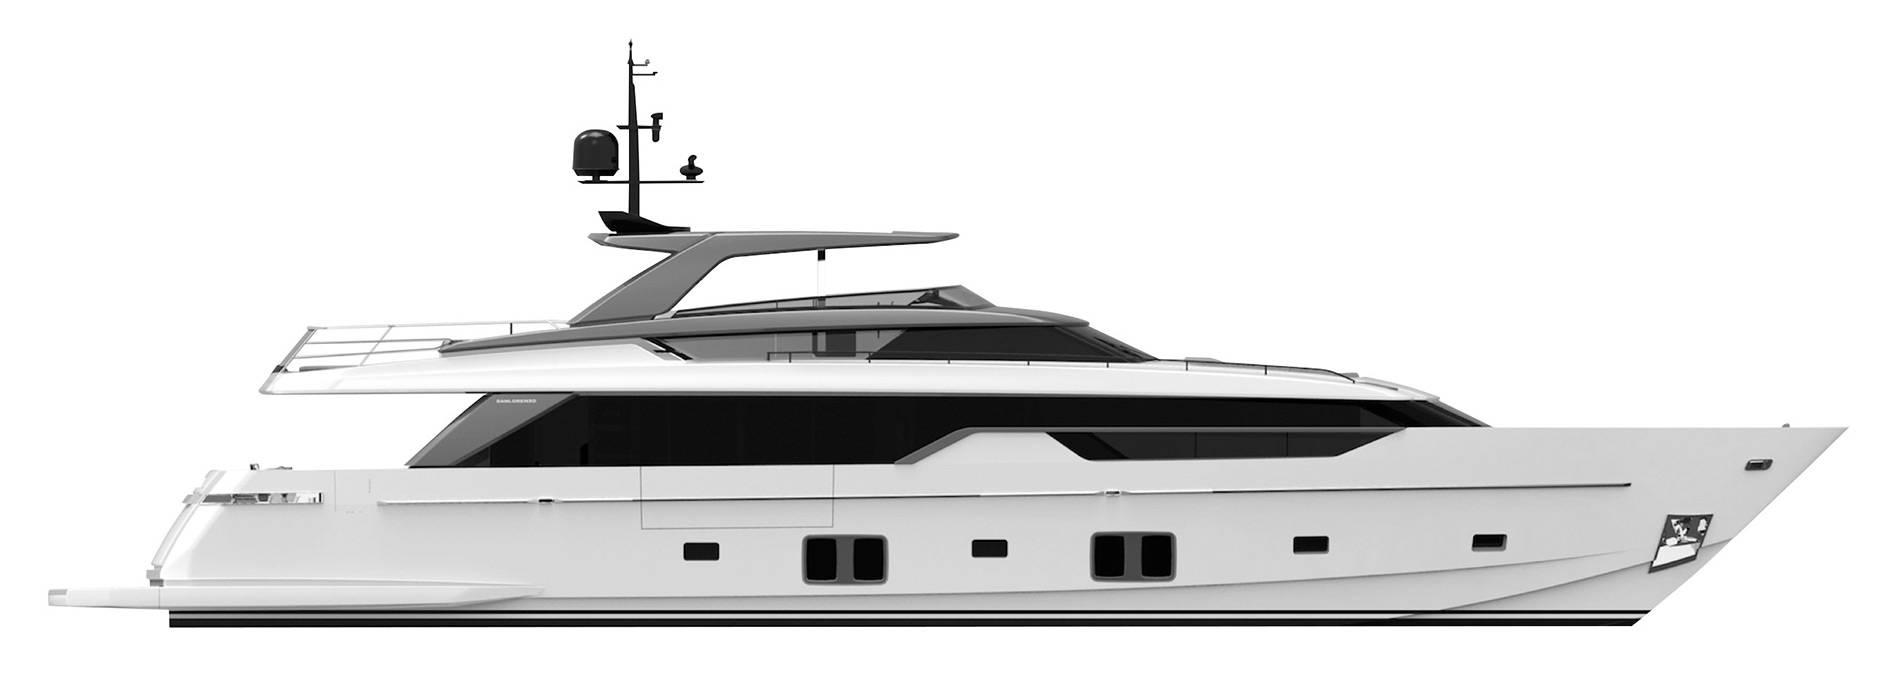 Sanlorenzo Yachts SL102 Asymmetric Профиль